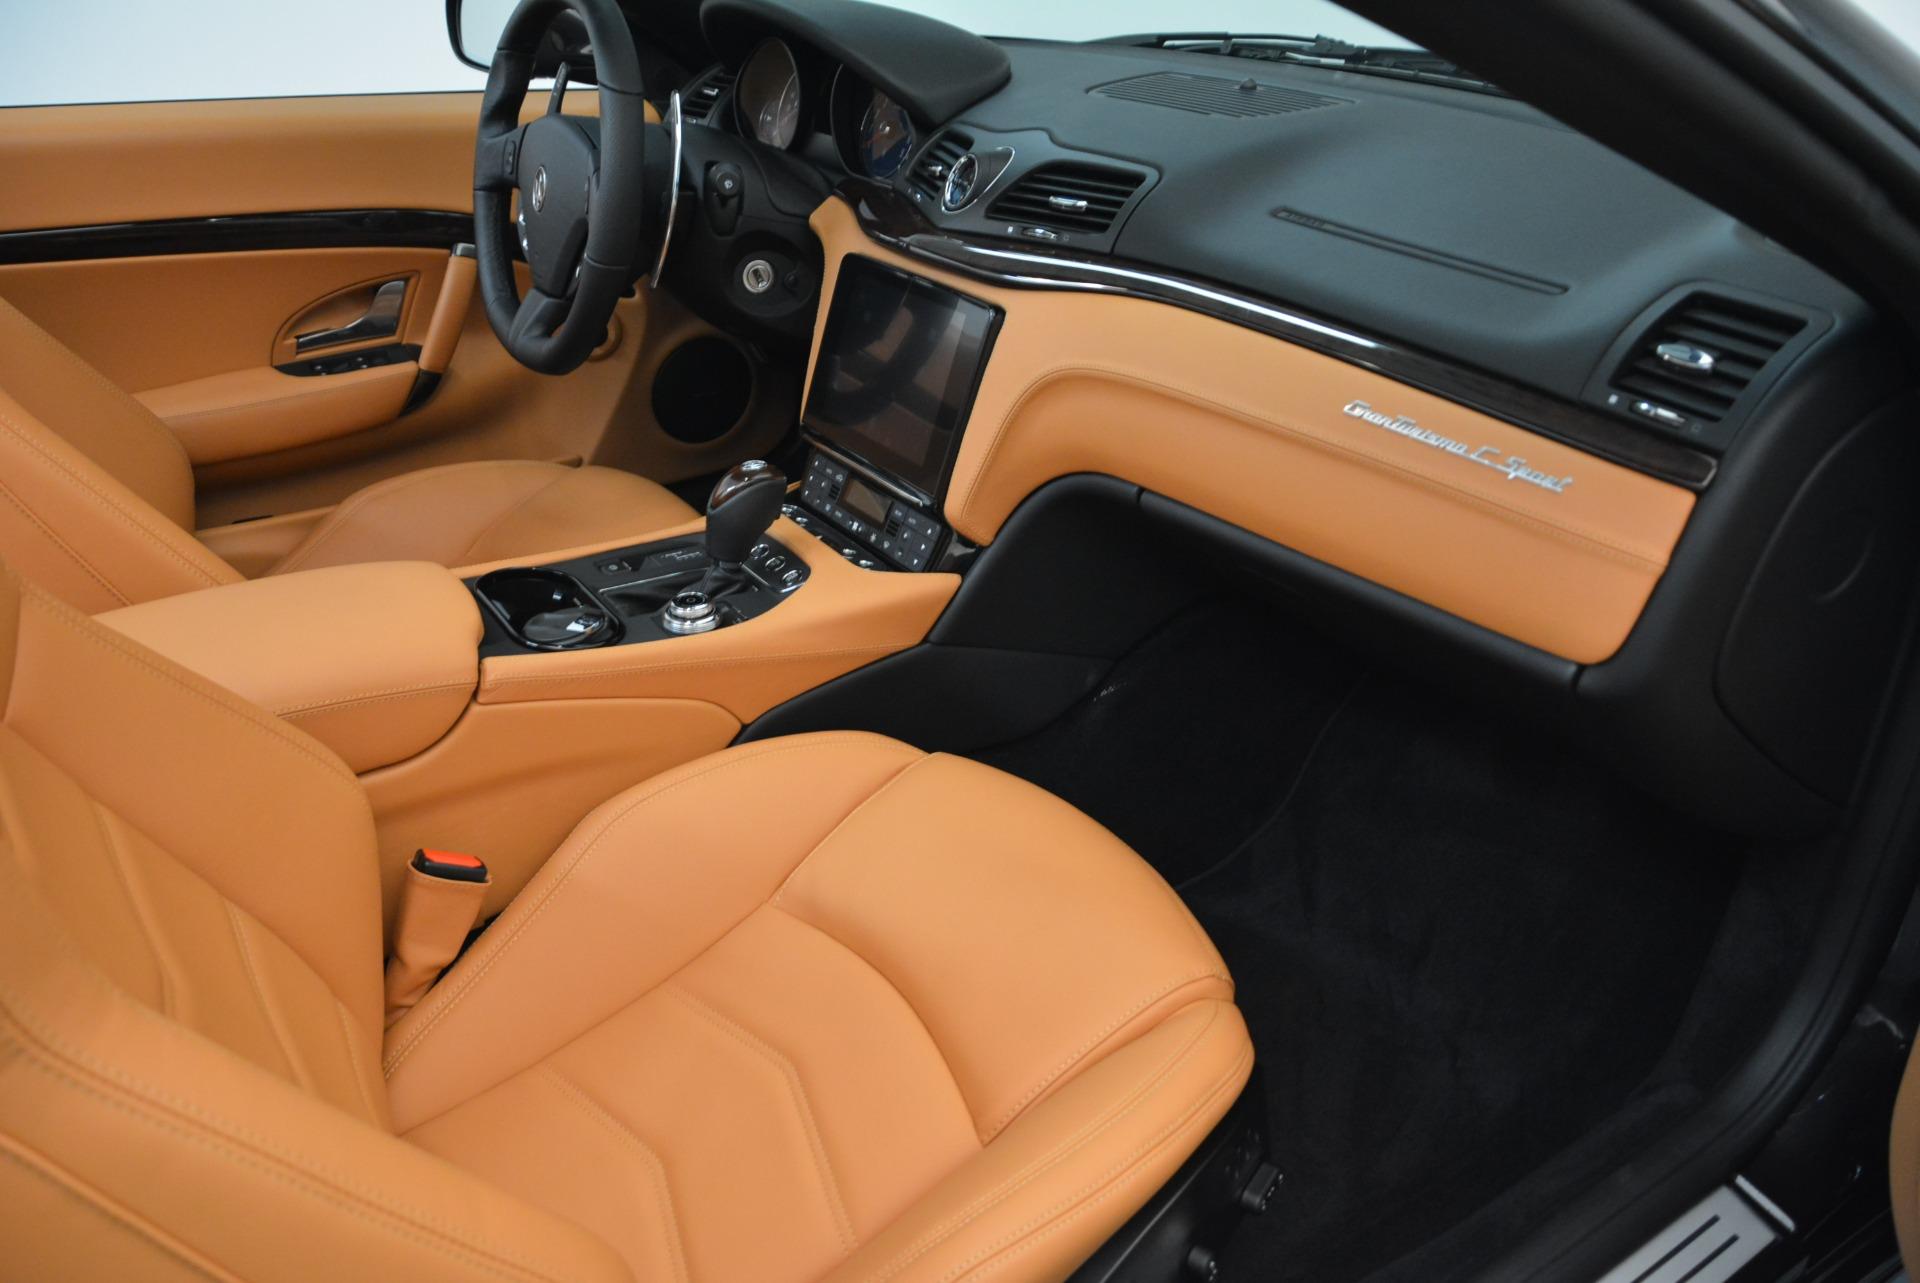 Used 2018 Maserati GranTurismo Sport Convertible For Sale In Westport, CT 1865_p31